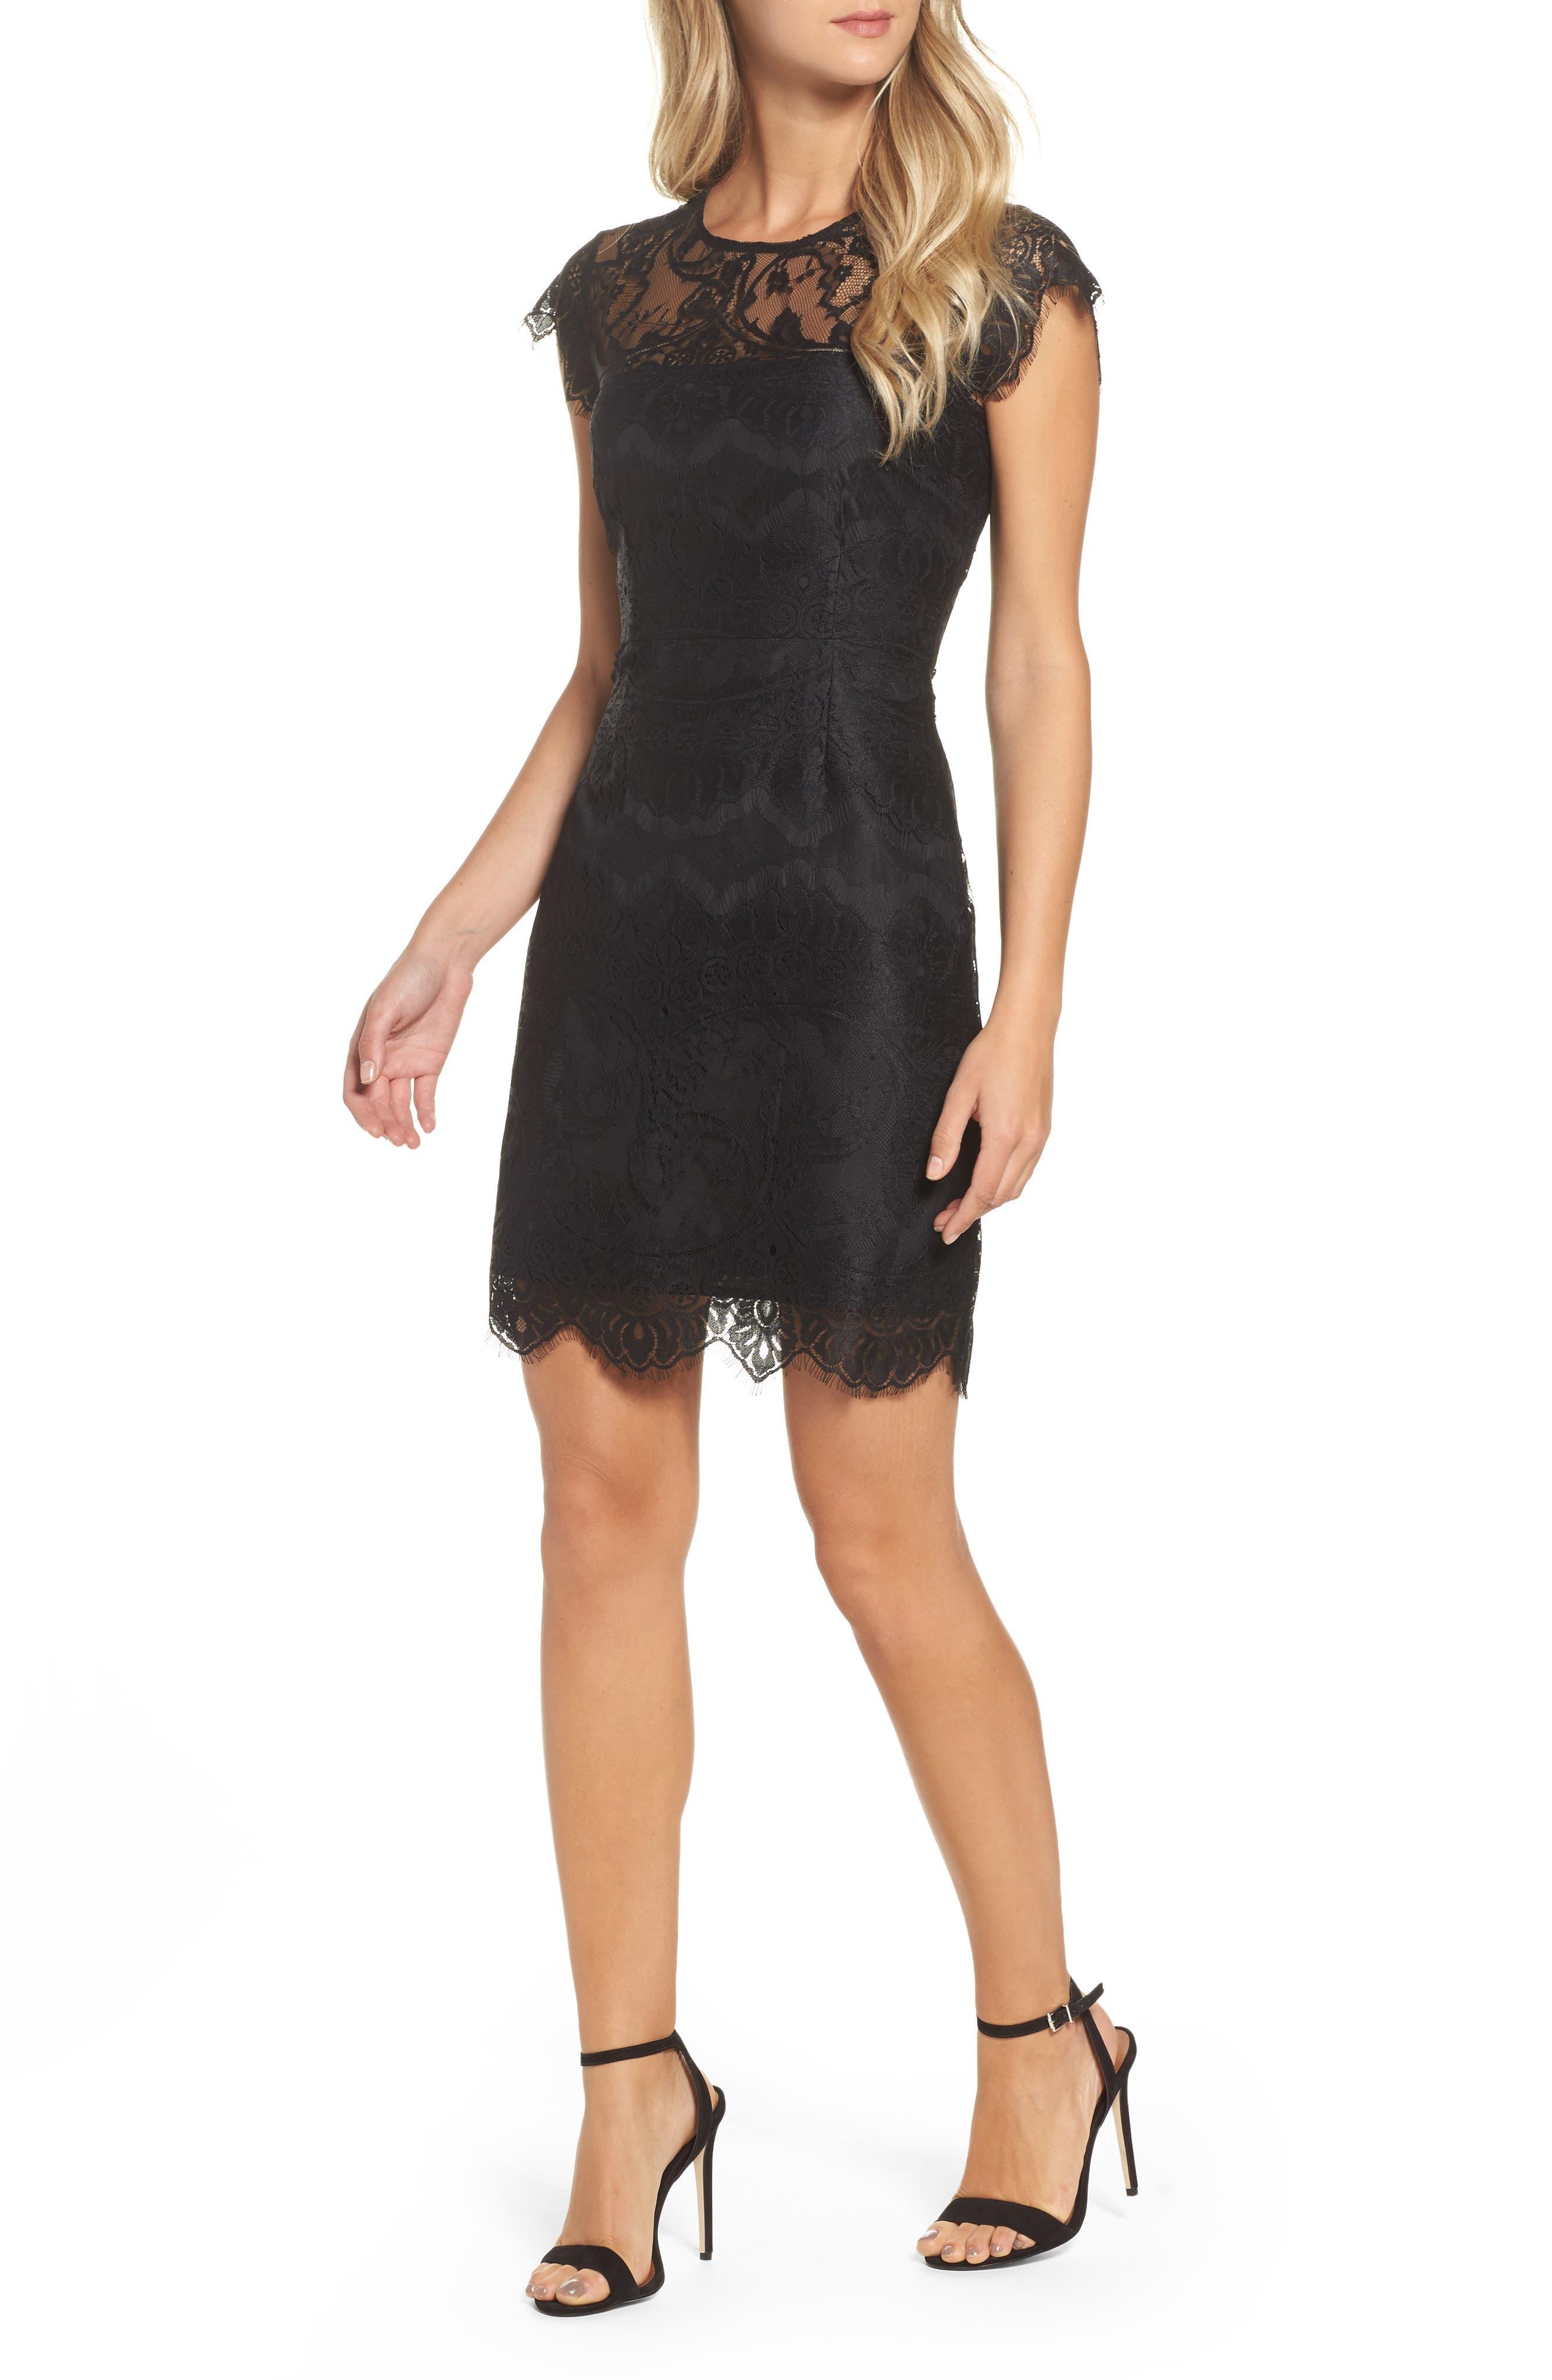 Bb Dakota Jayce Lace Sheath Cocktail Dress, Black